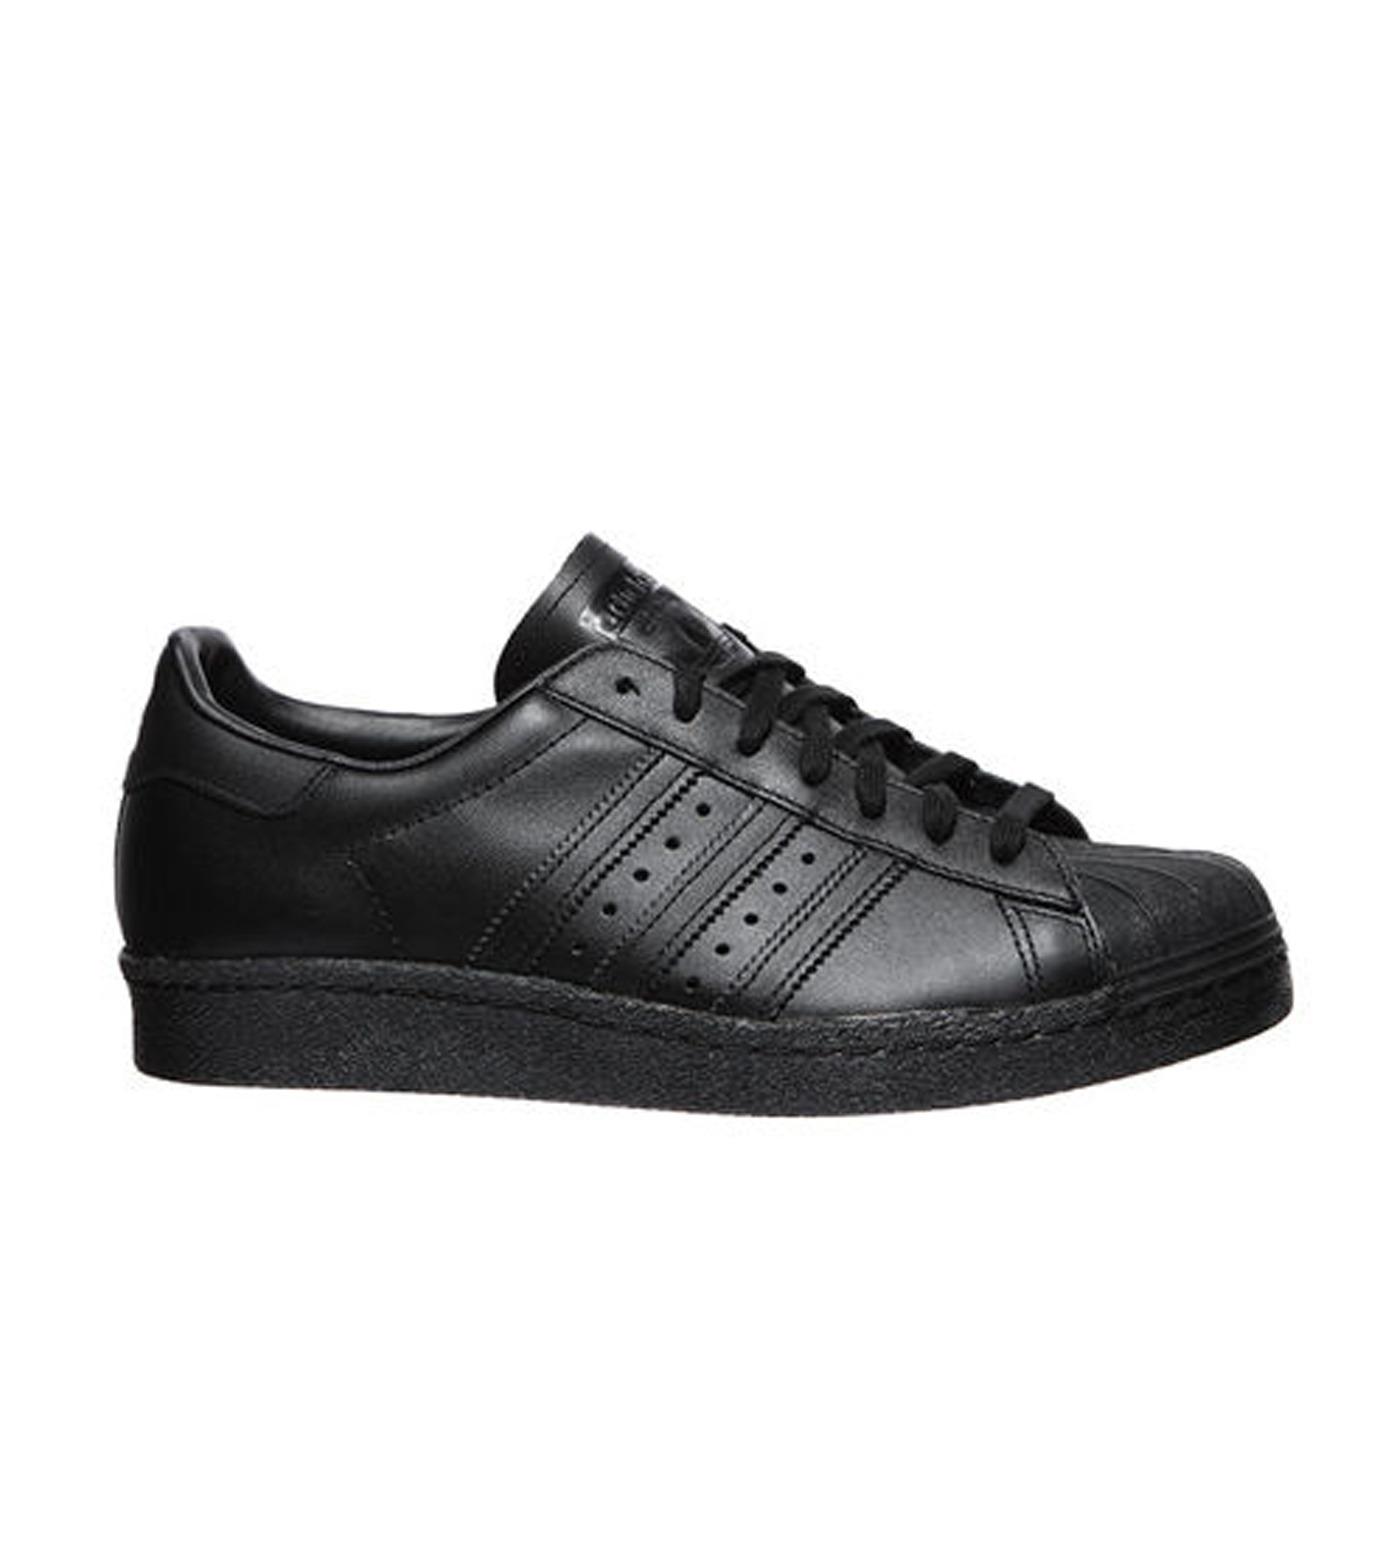 adidas(アディダス)のSUPERSTAR 80s-BLACK(シューズ/shoes)-S79442-13 拡大詳細画像1